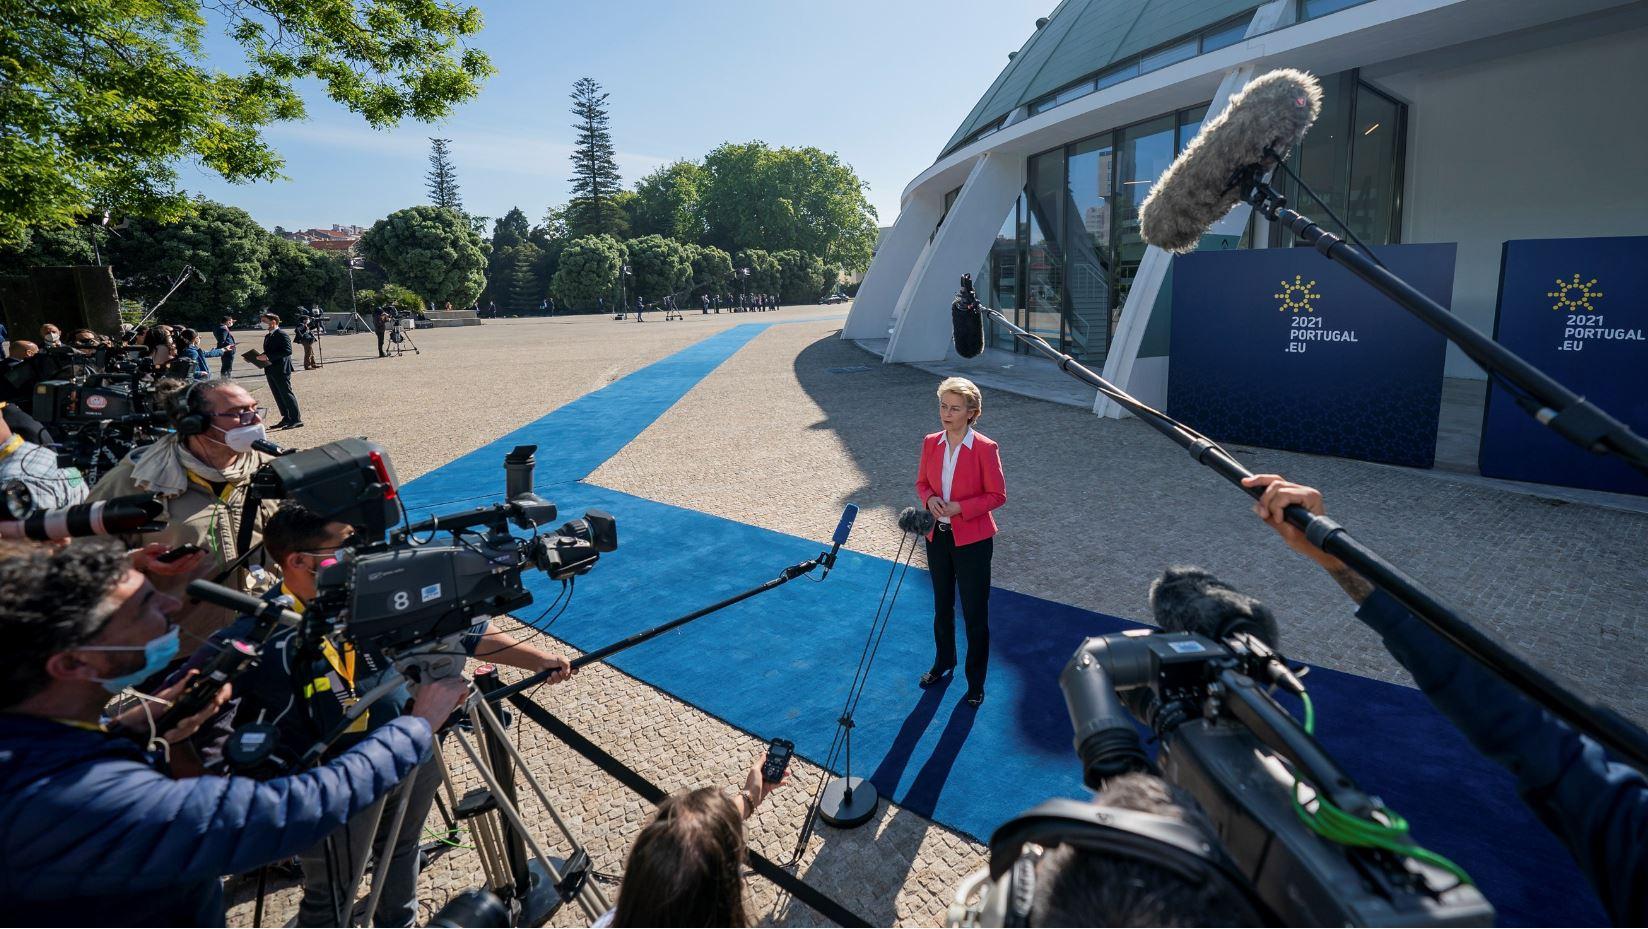 The social pillar strengthened after EU Porto summit